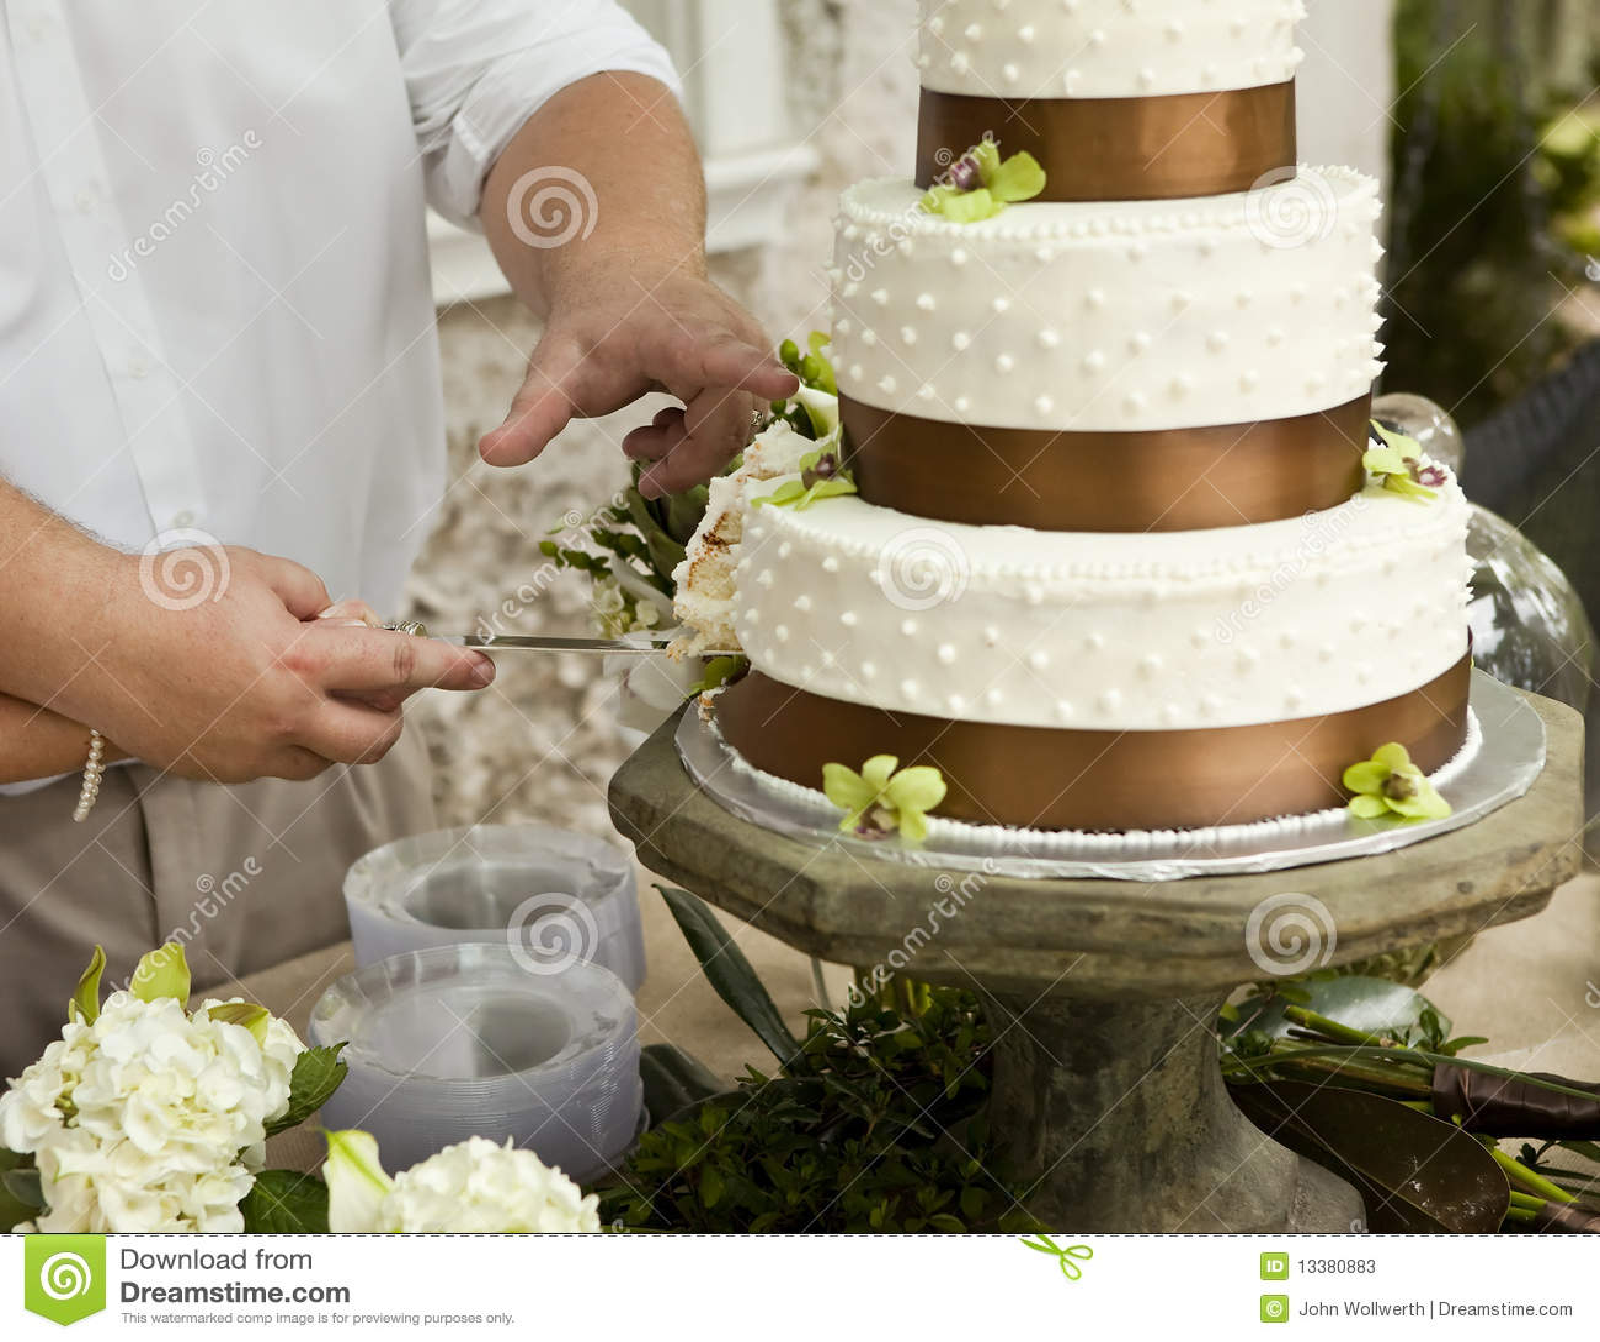 Cutting Wedding Cake Stock Photos